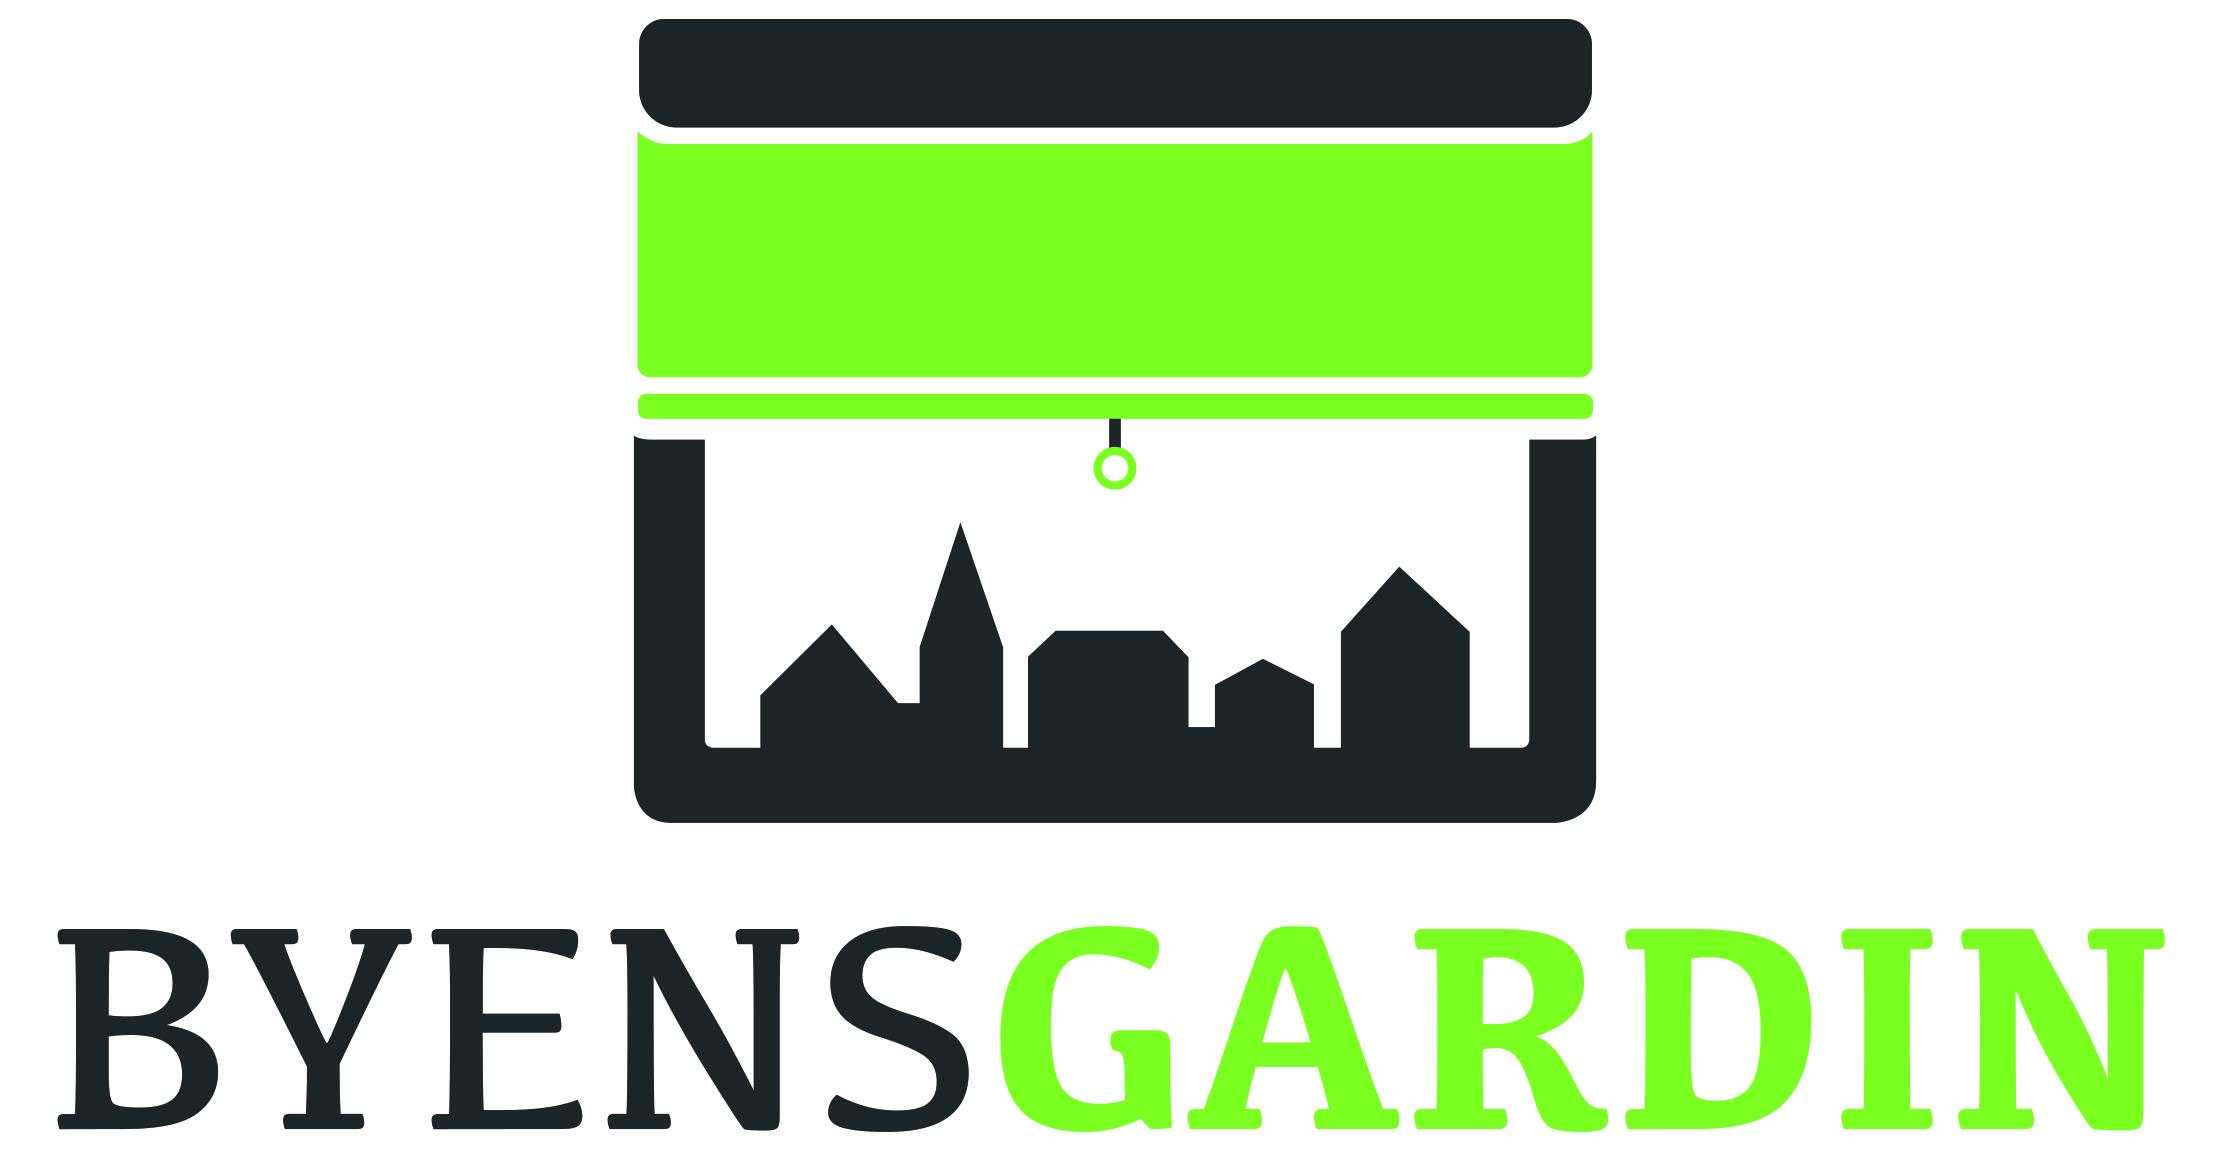 Byens-gardin-logo-final